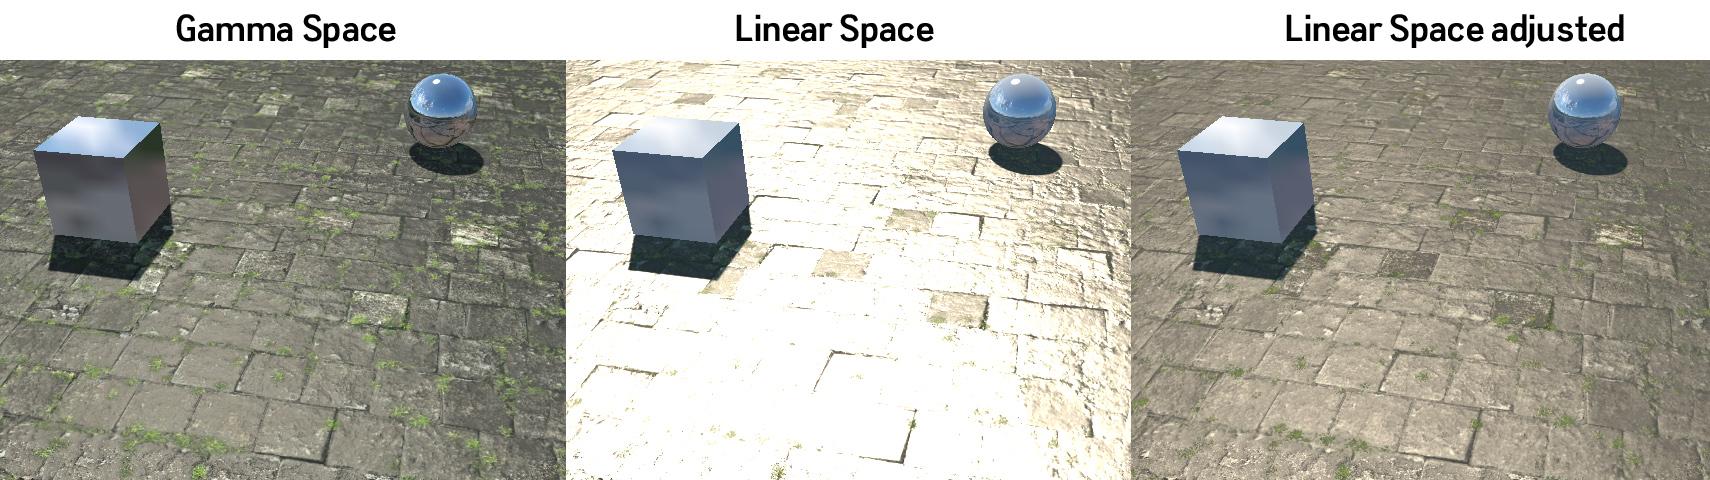 linearspace.jpg